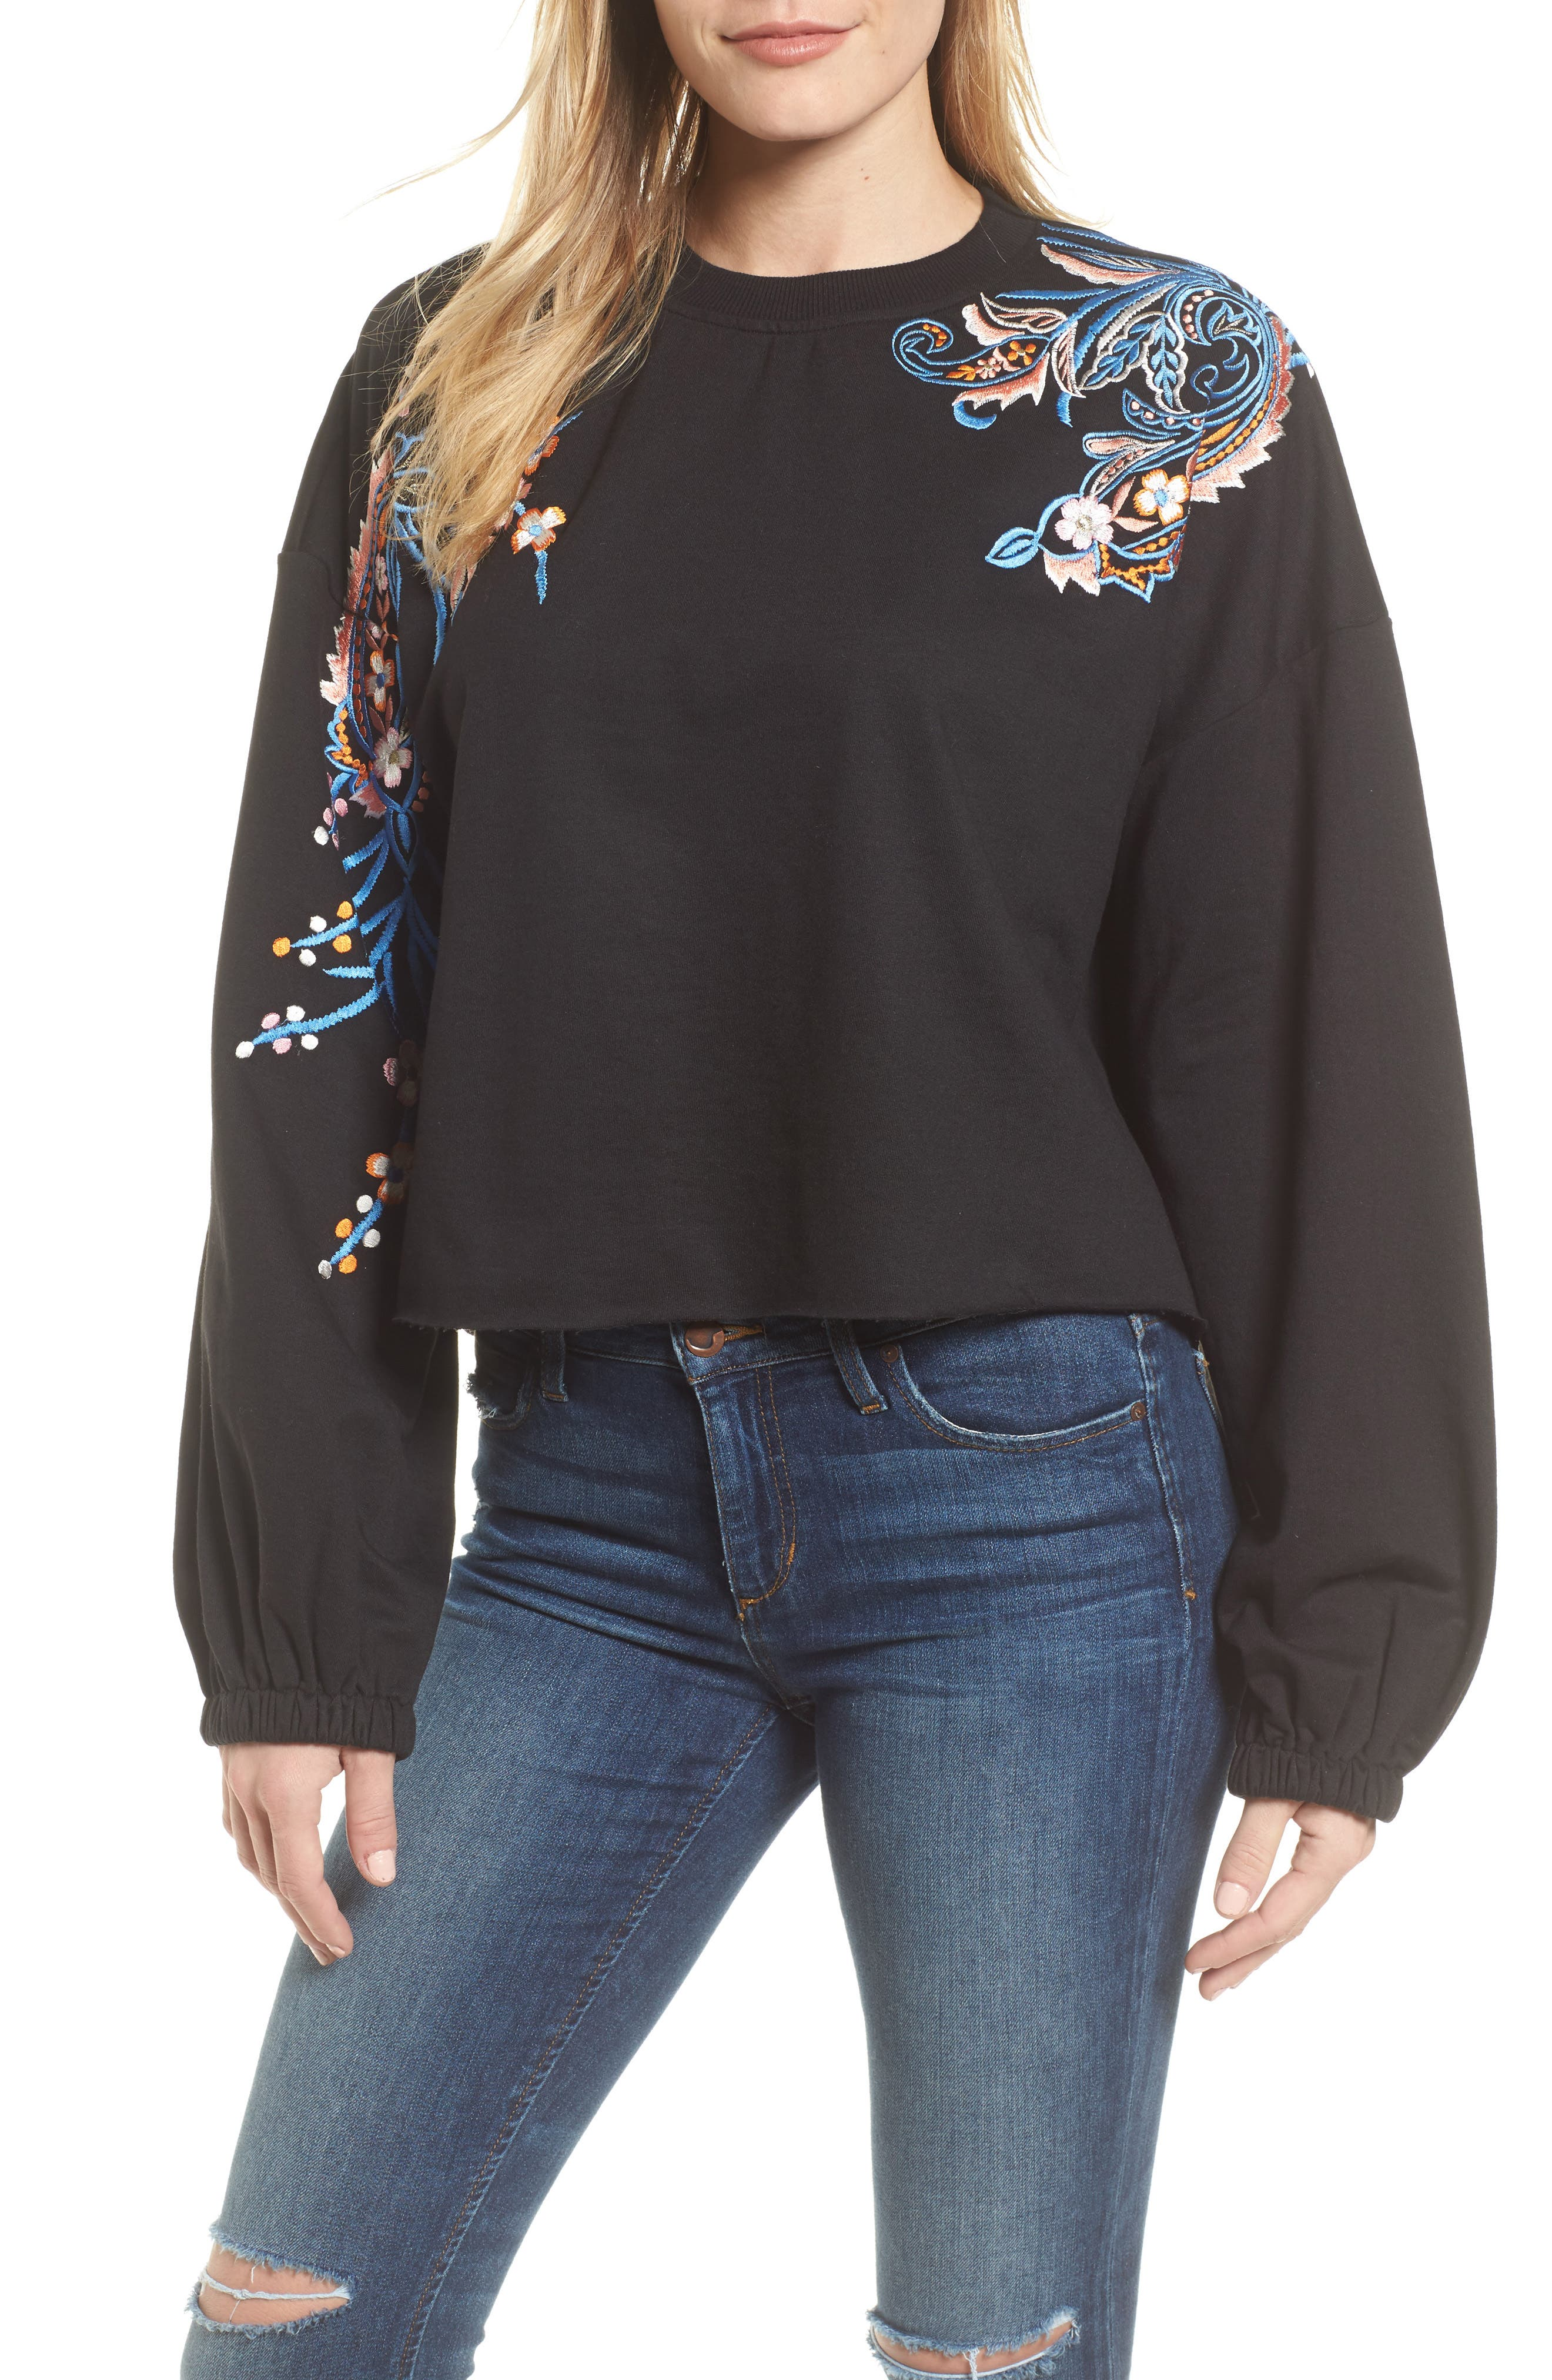 Main Image - KAS New York Carlisle Embroidered Sweatshirt